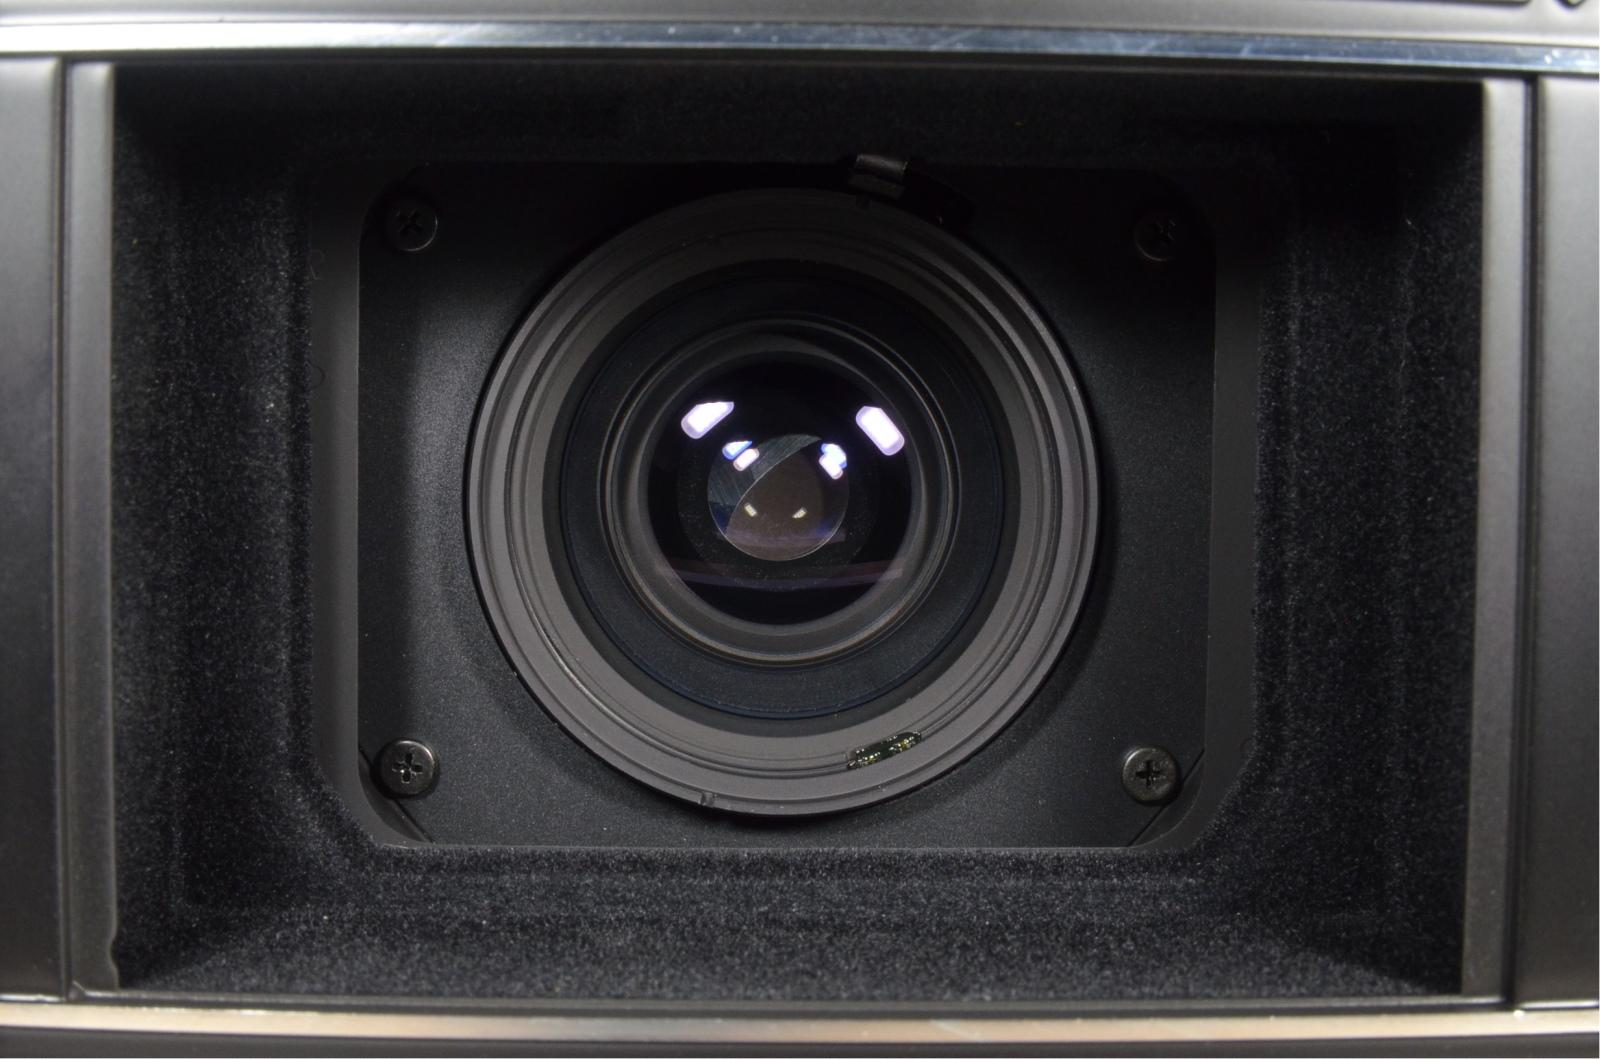 fuji fujifilm gsw690iii 65mm f5.6 medium format count only '017' vary rare!